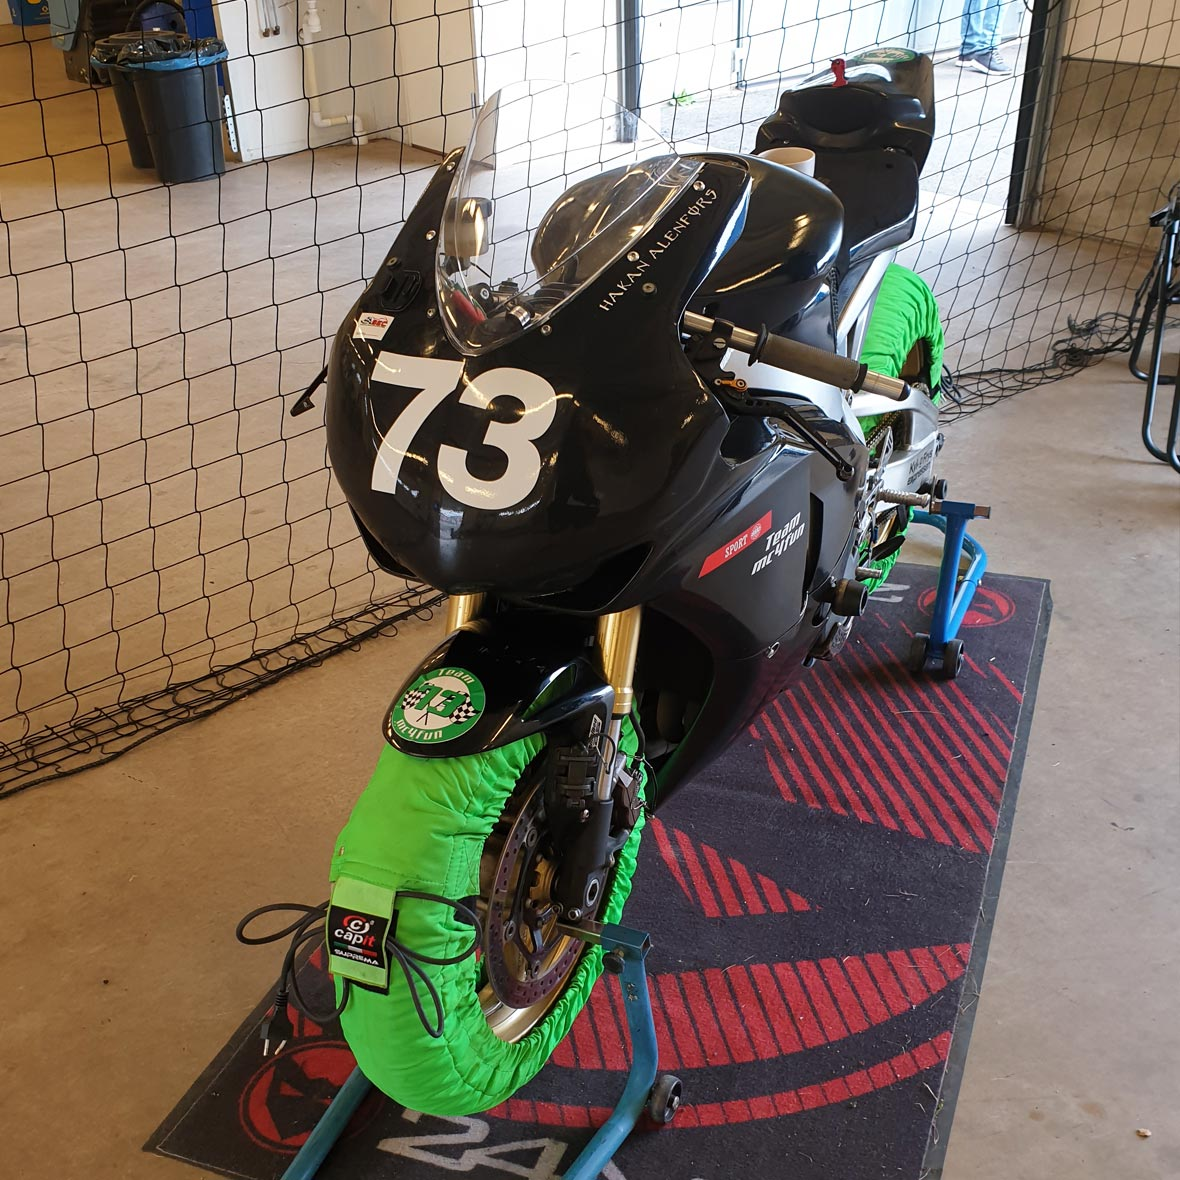 Honda CBR1000RR - Team mc4fun - Håkan Alenfors